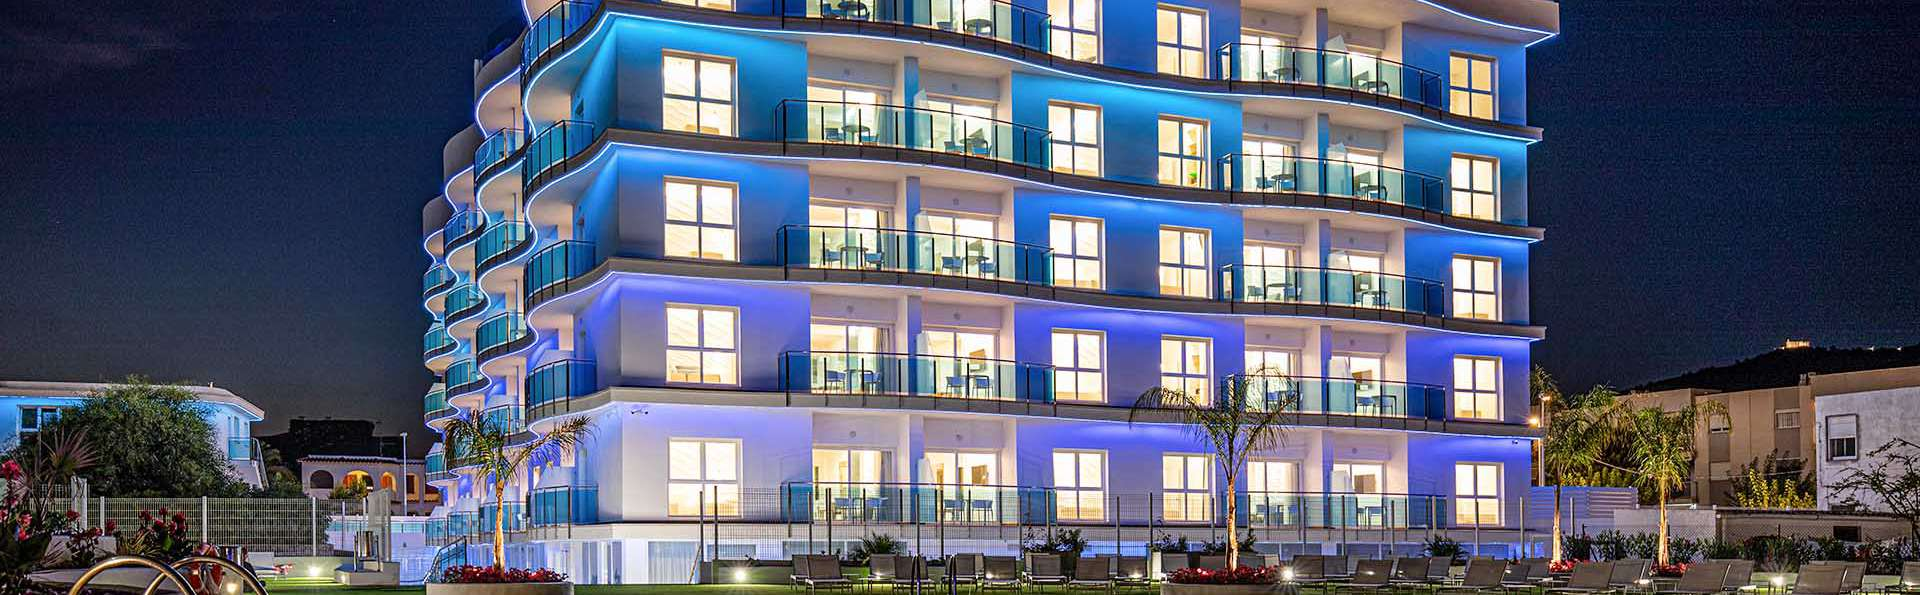 Alcossebre Sea Experience Aparthotel - EDIT_EXTERIOR_02.jpg